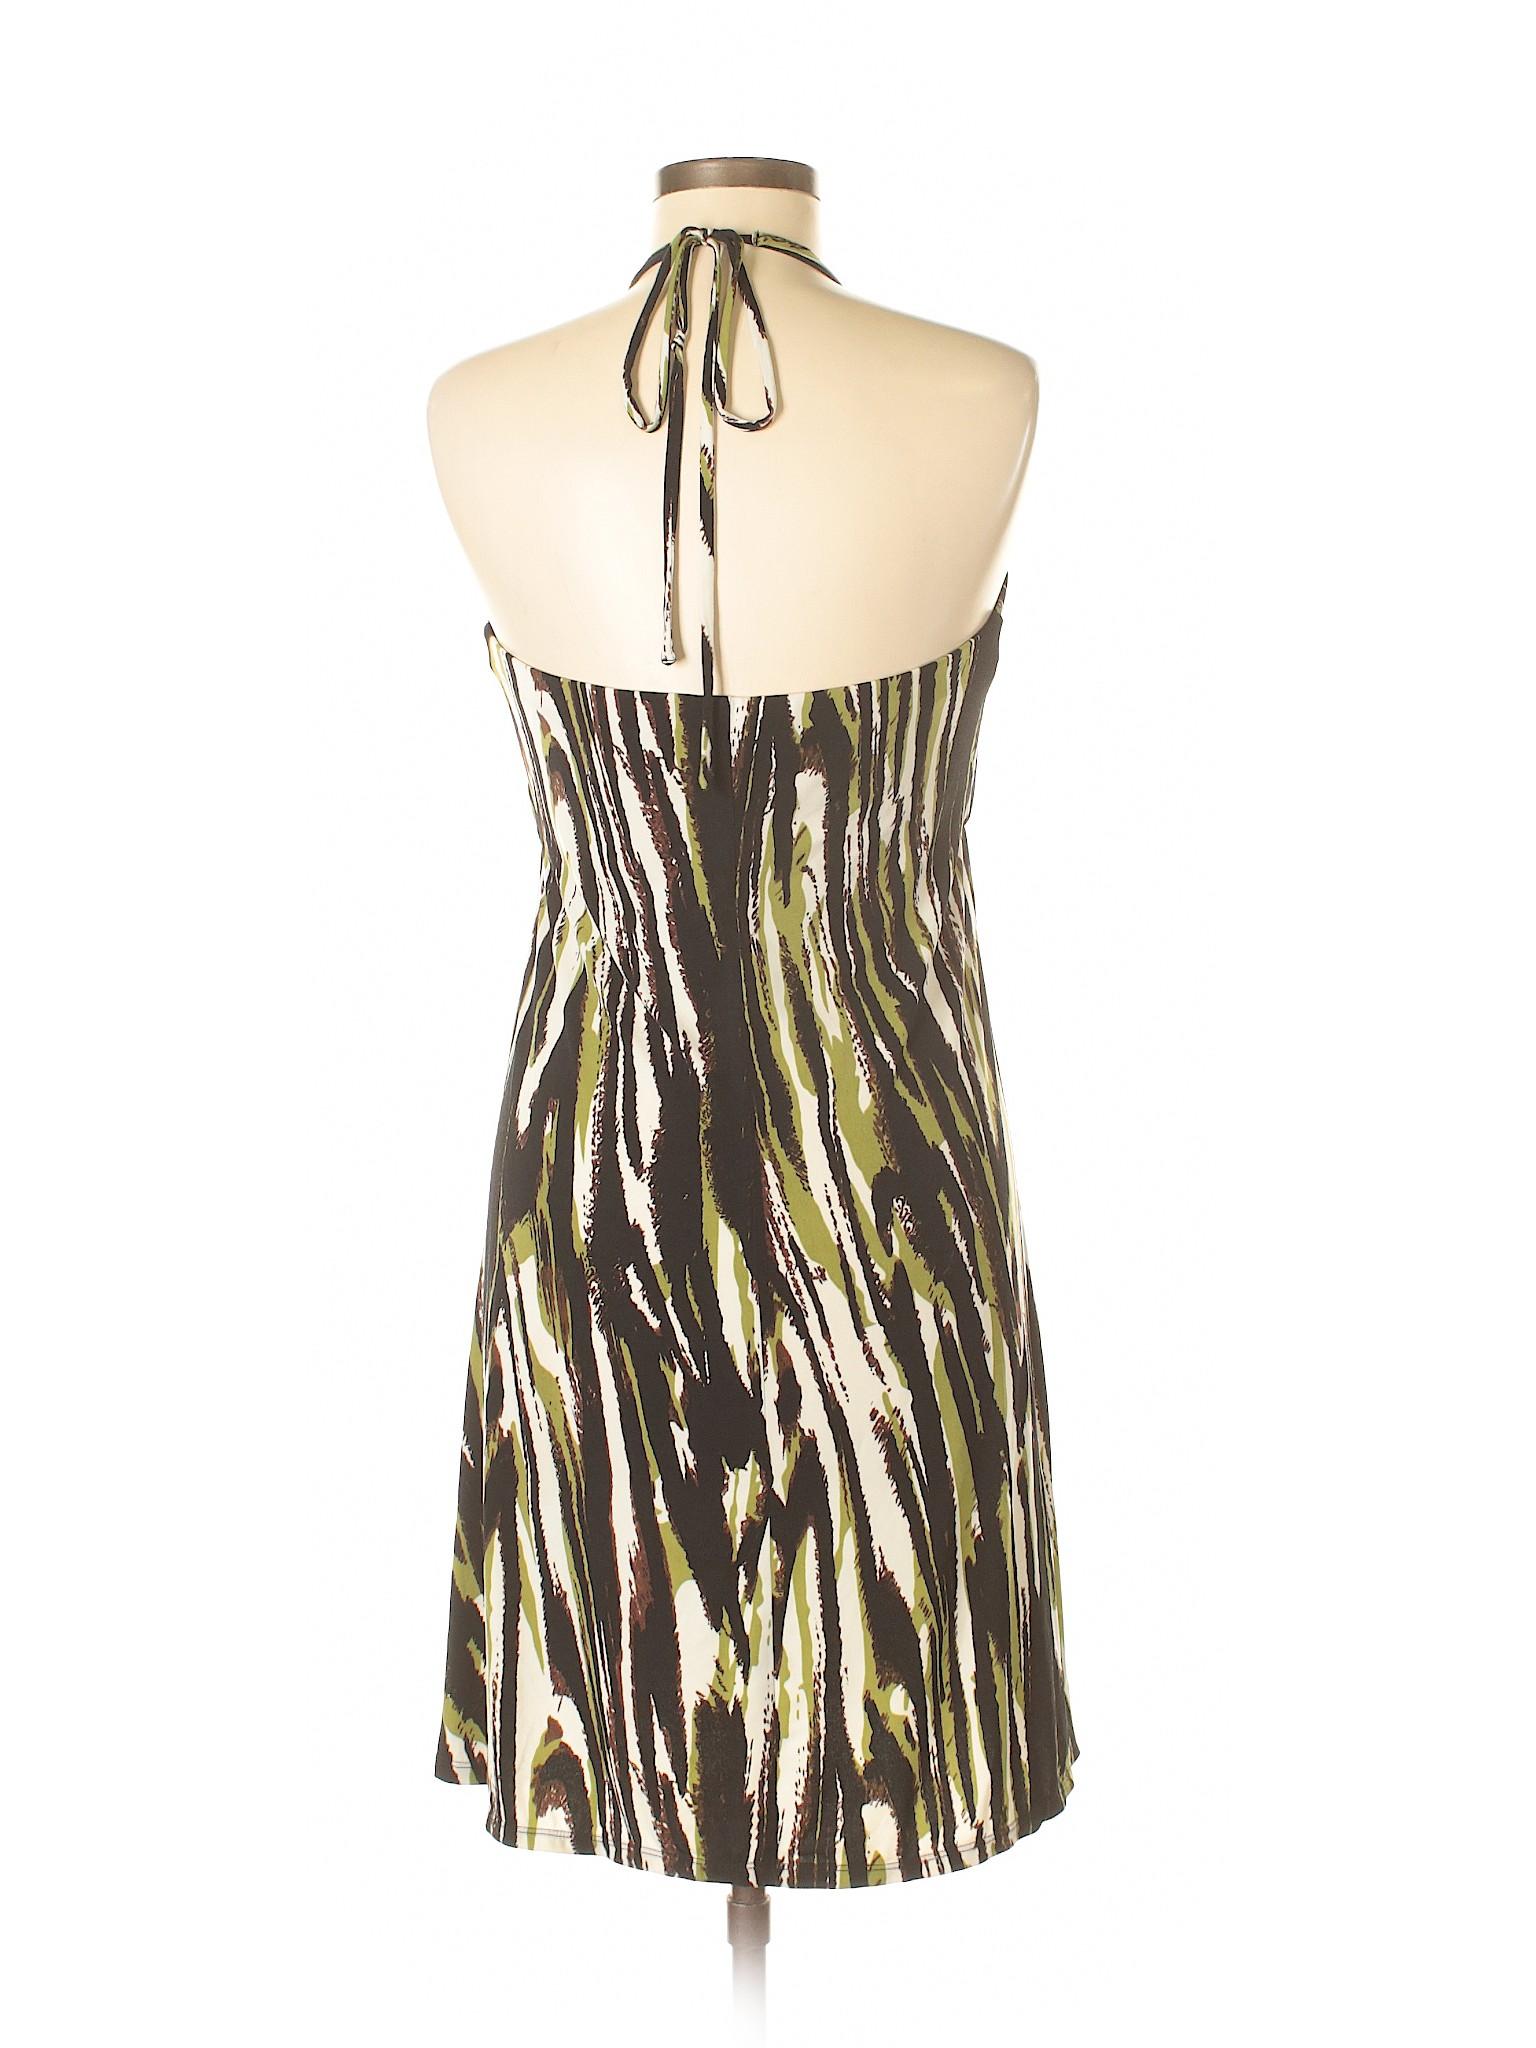 Bisou Boutique Casual winter Dress Bisou 0qF6Zq